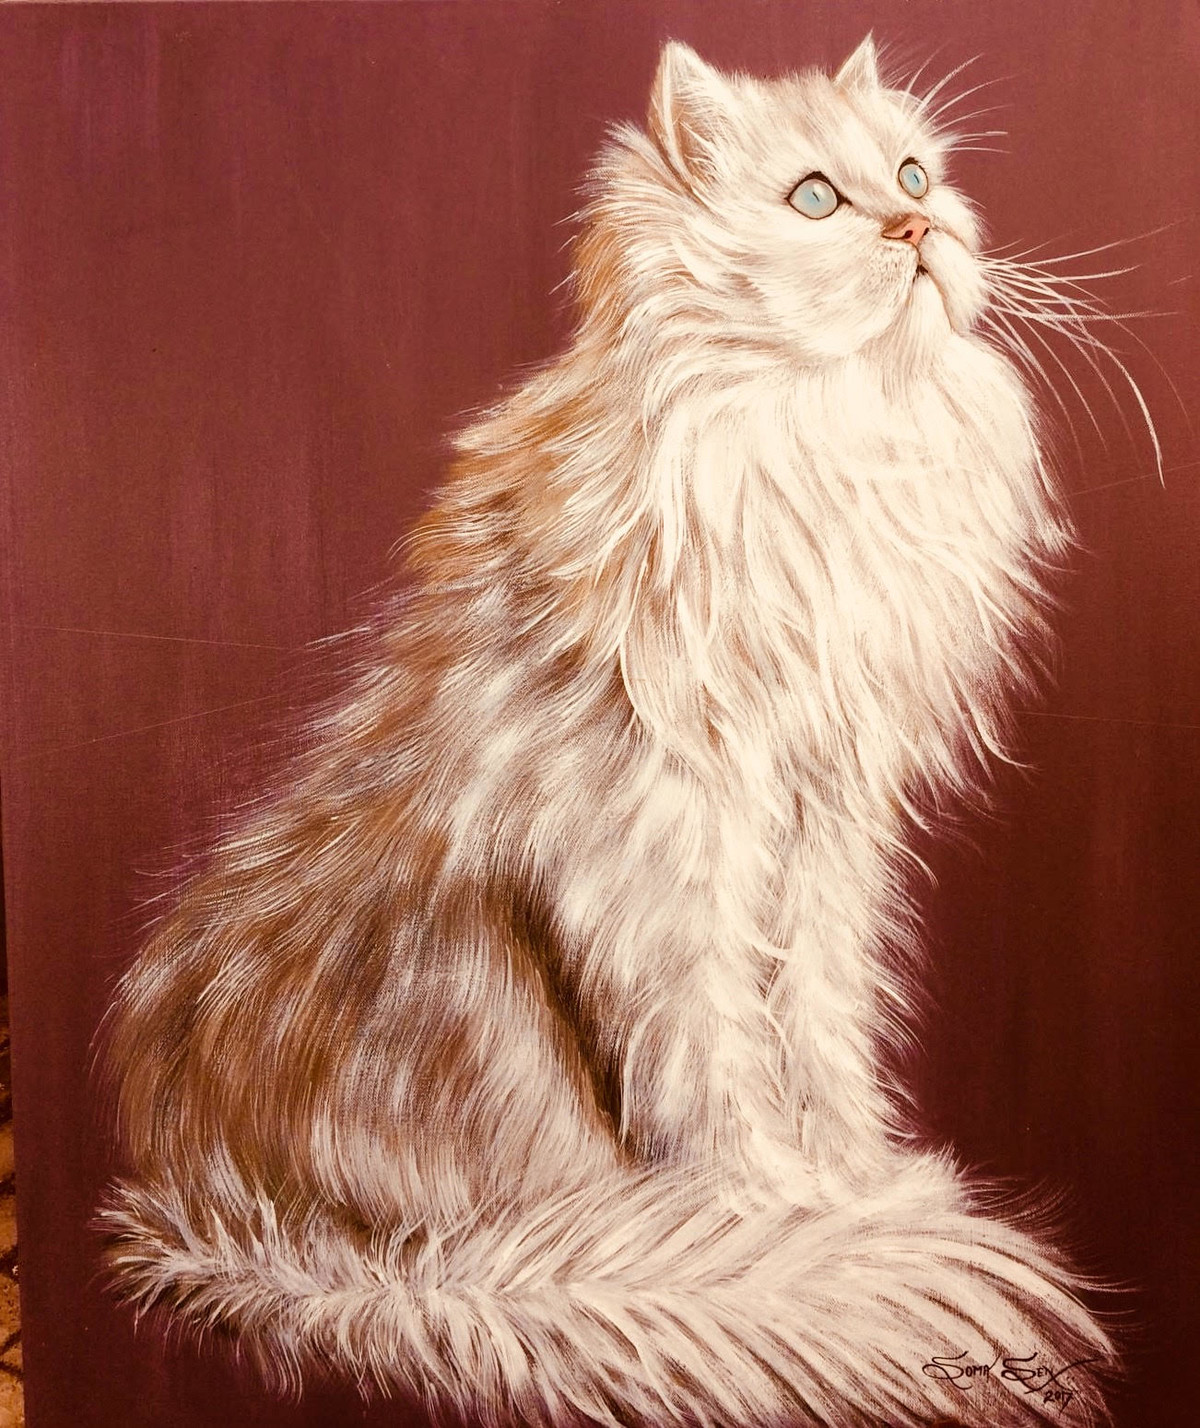 The White Cat Digital Print by Soma Sen,Photorealism